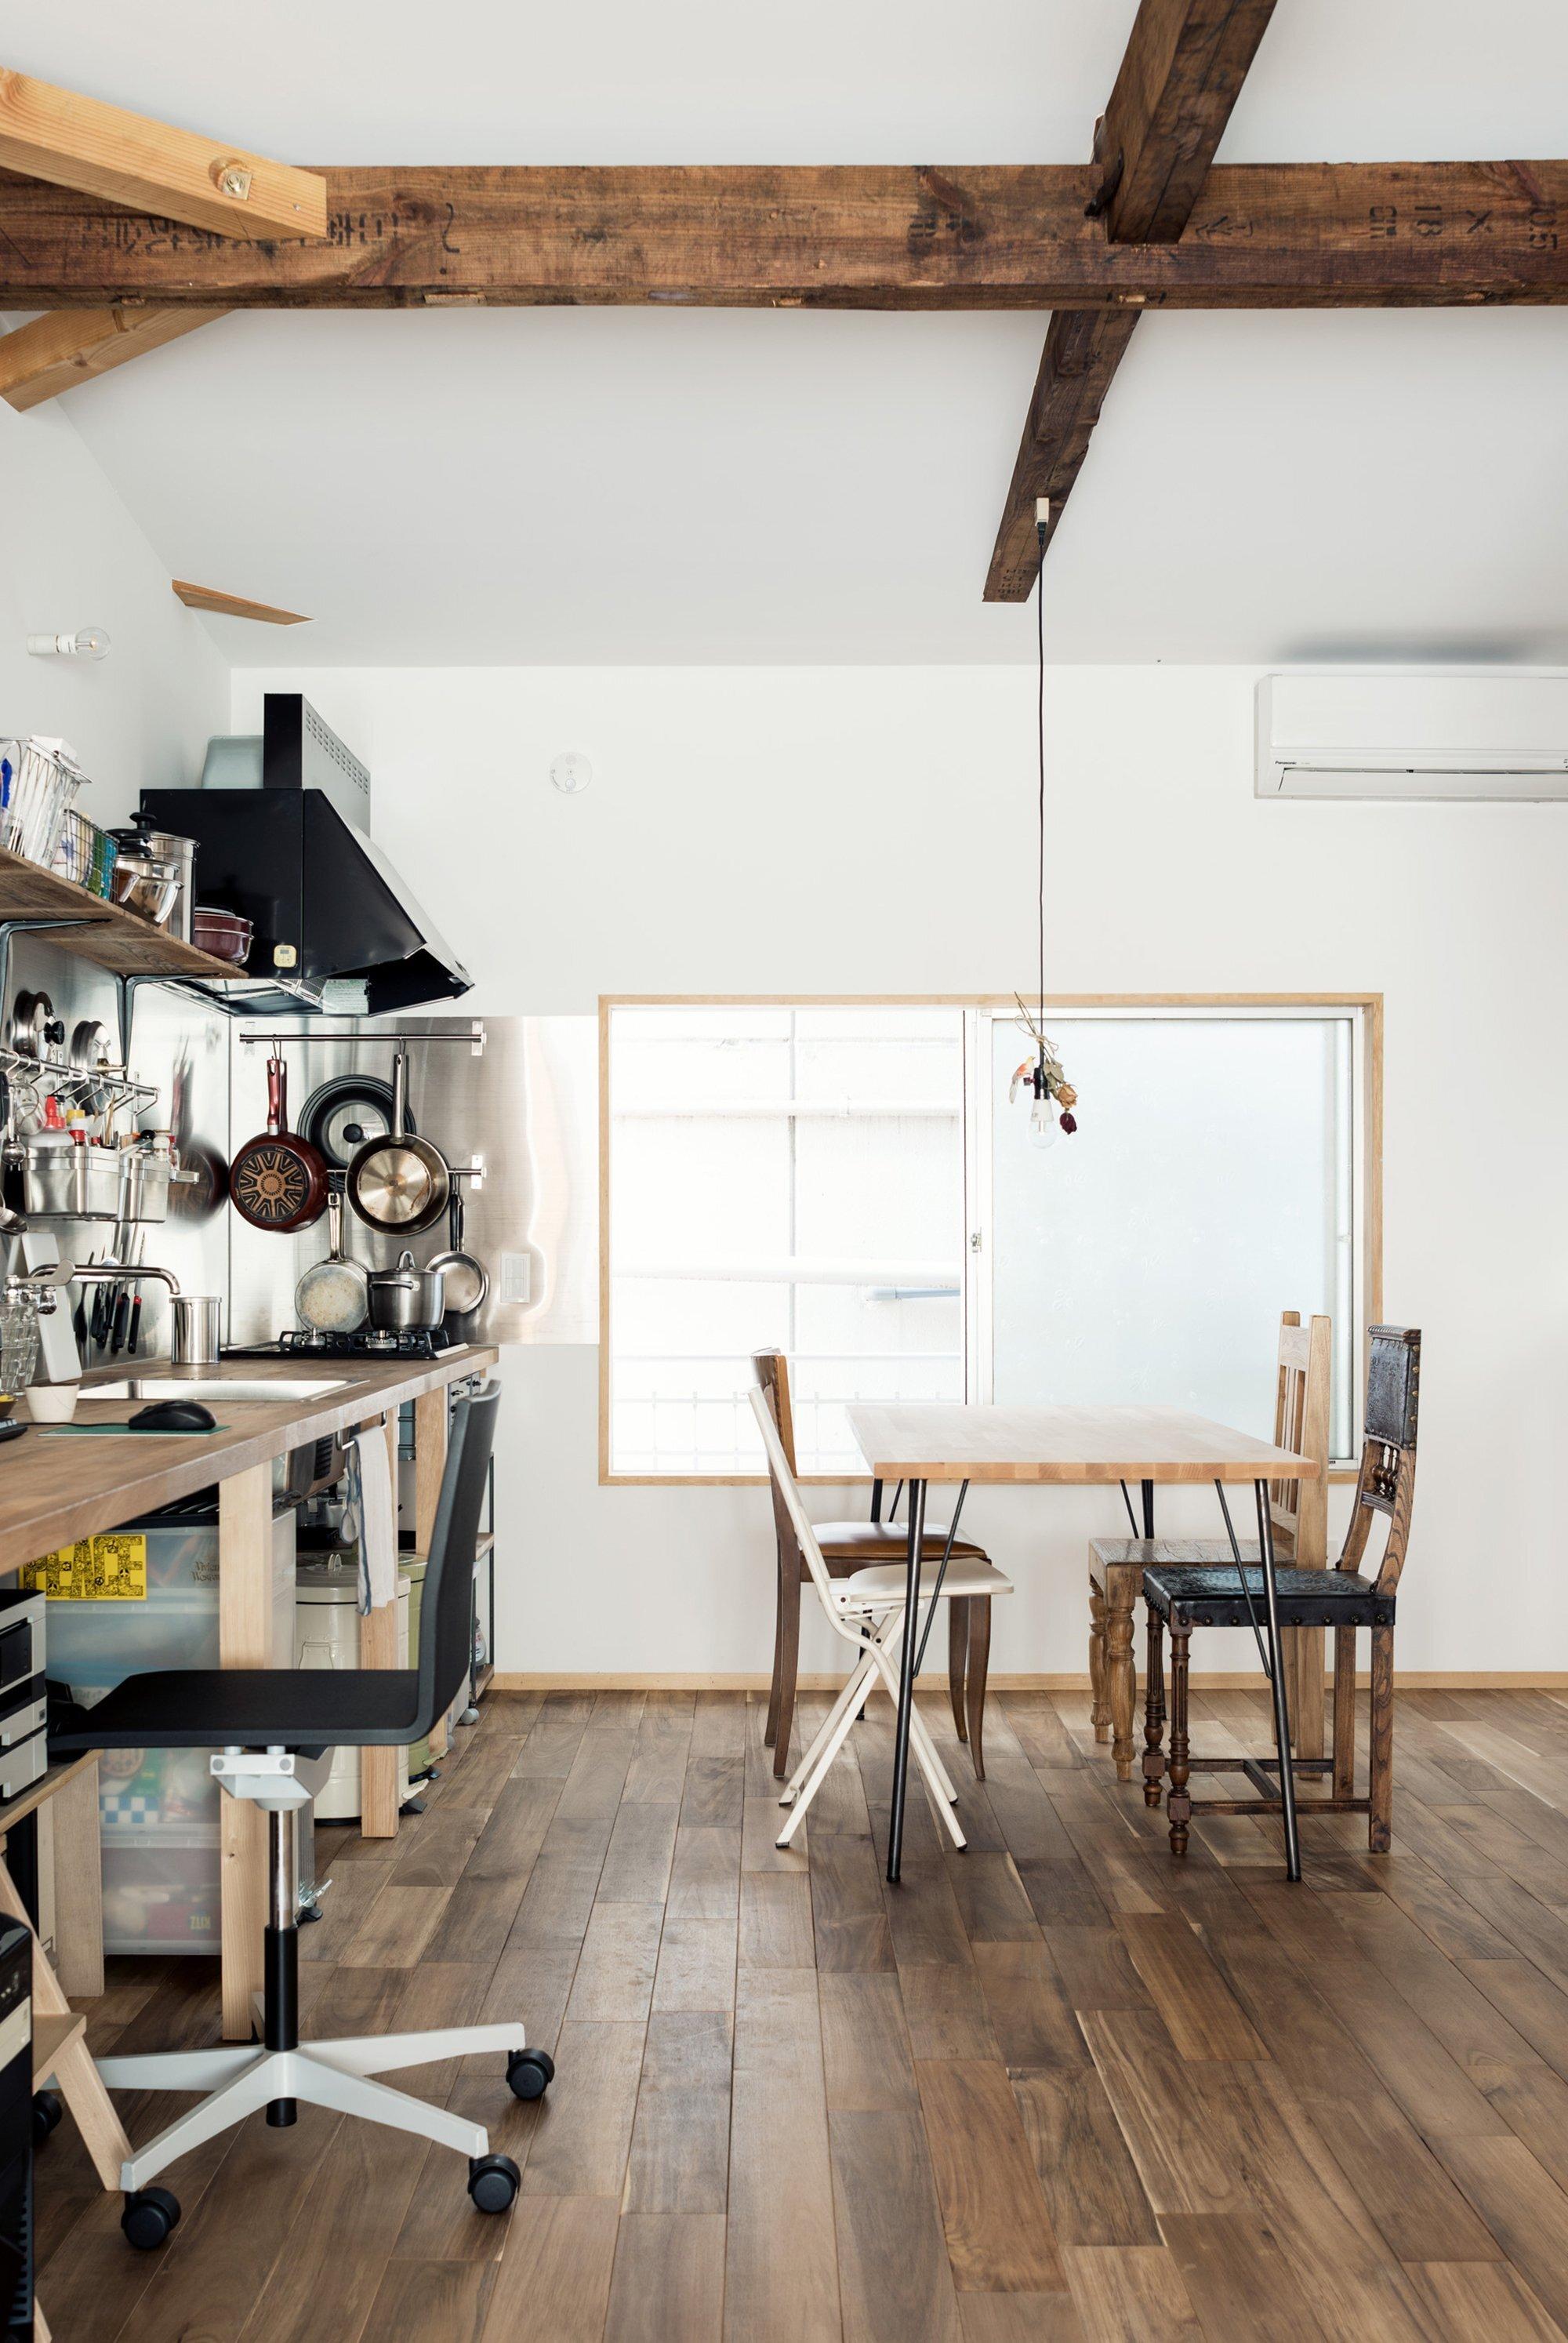 Re-Toyosaki - Small Japanese House - Coil Kazuteru Matumura Architects - Osaka Japan - Kitchen - Humble Homes